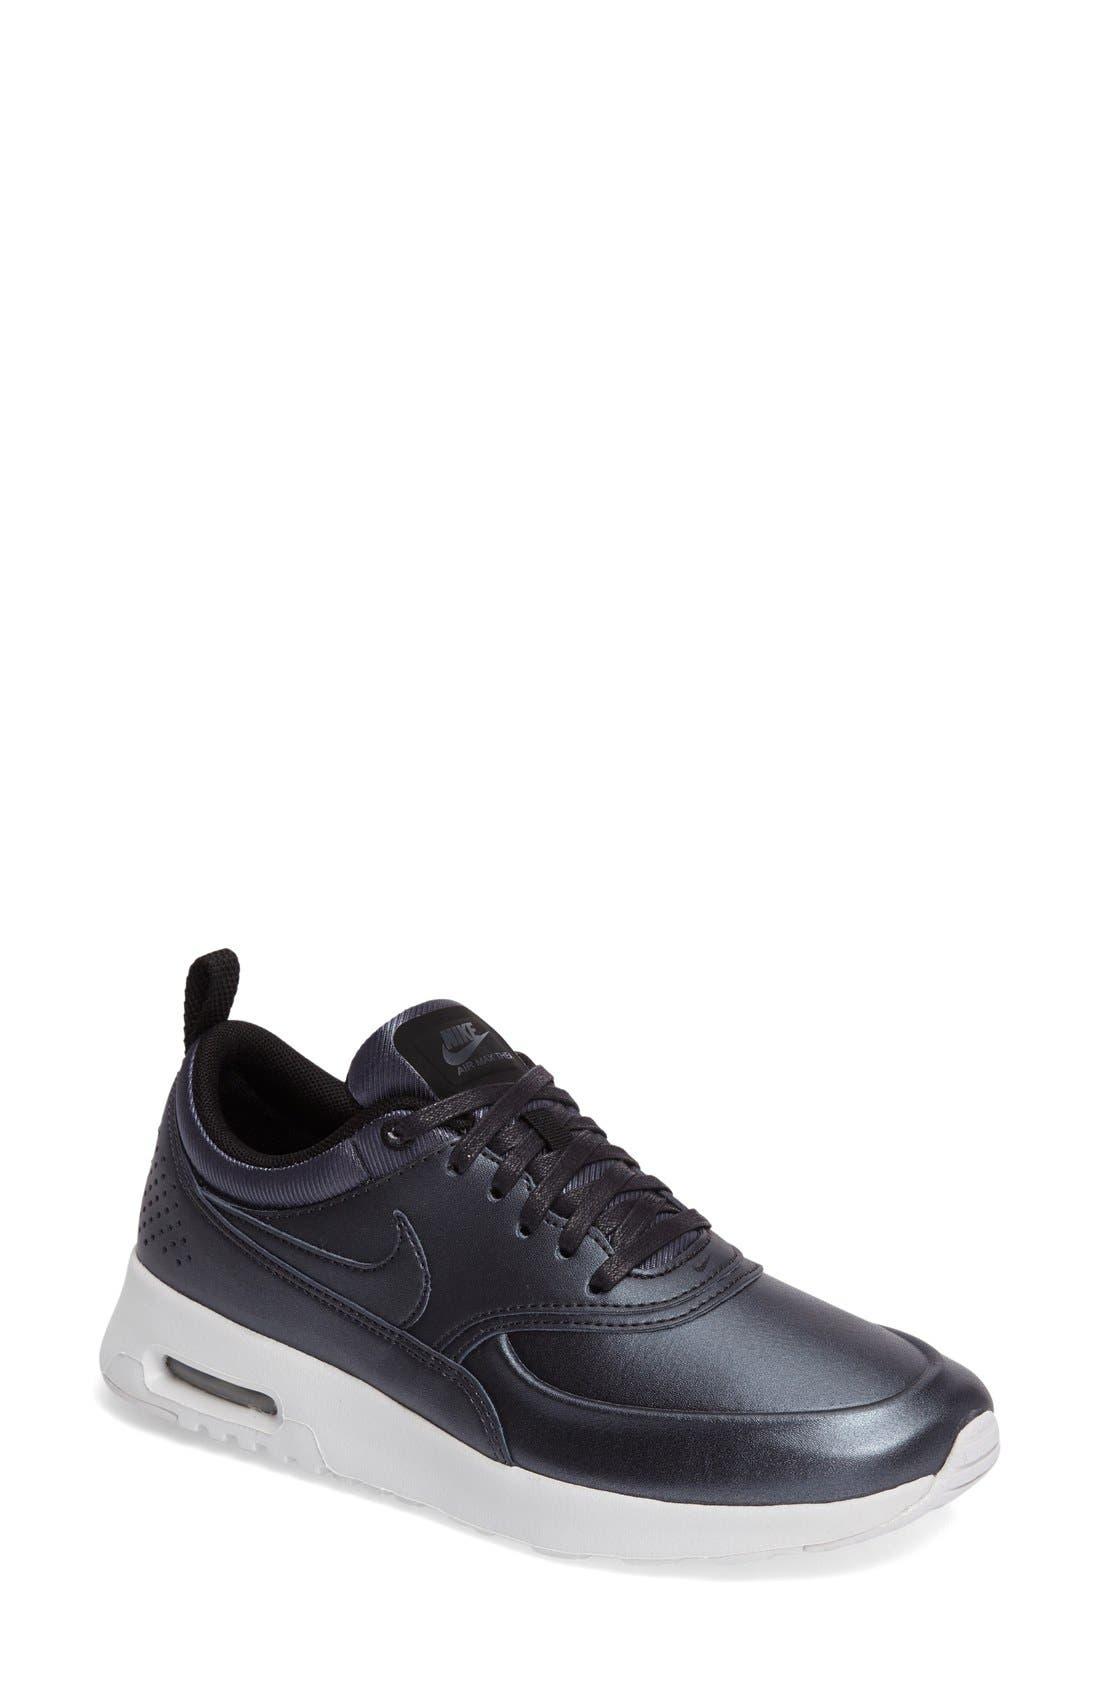 Nike Air Max Thea SE Sneaker (Women